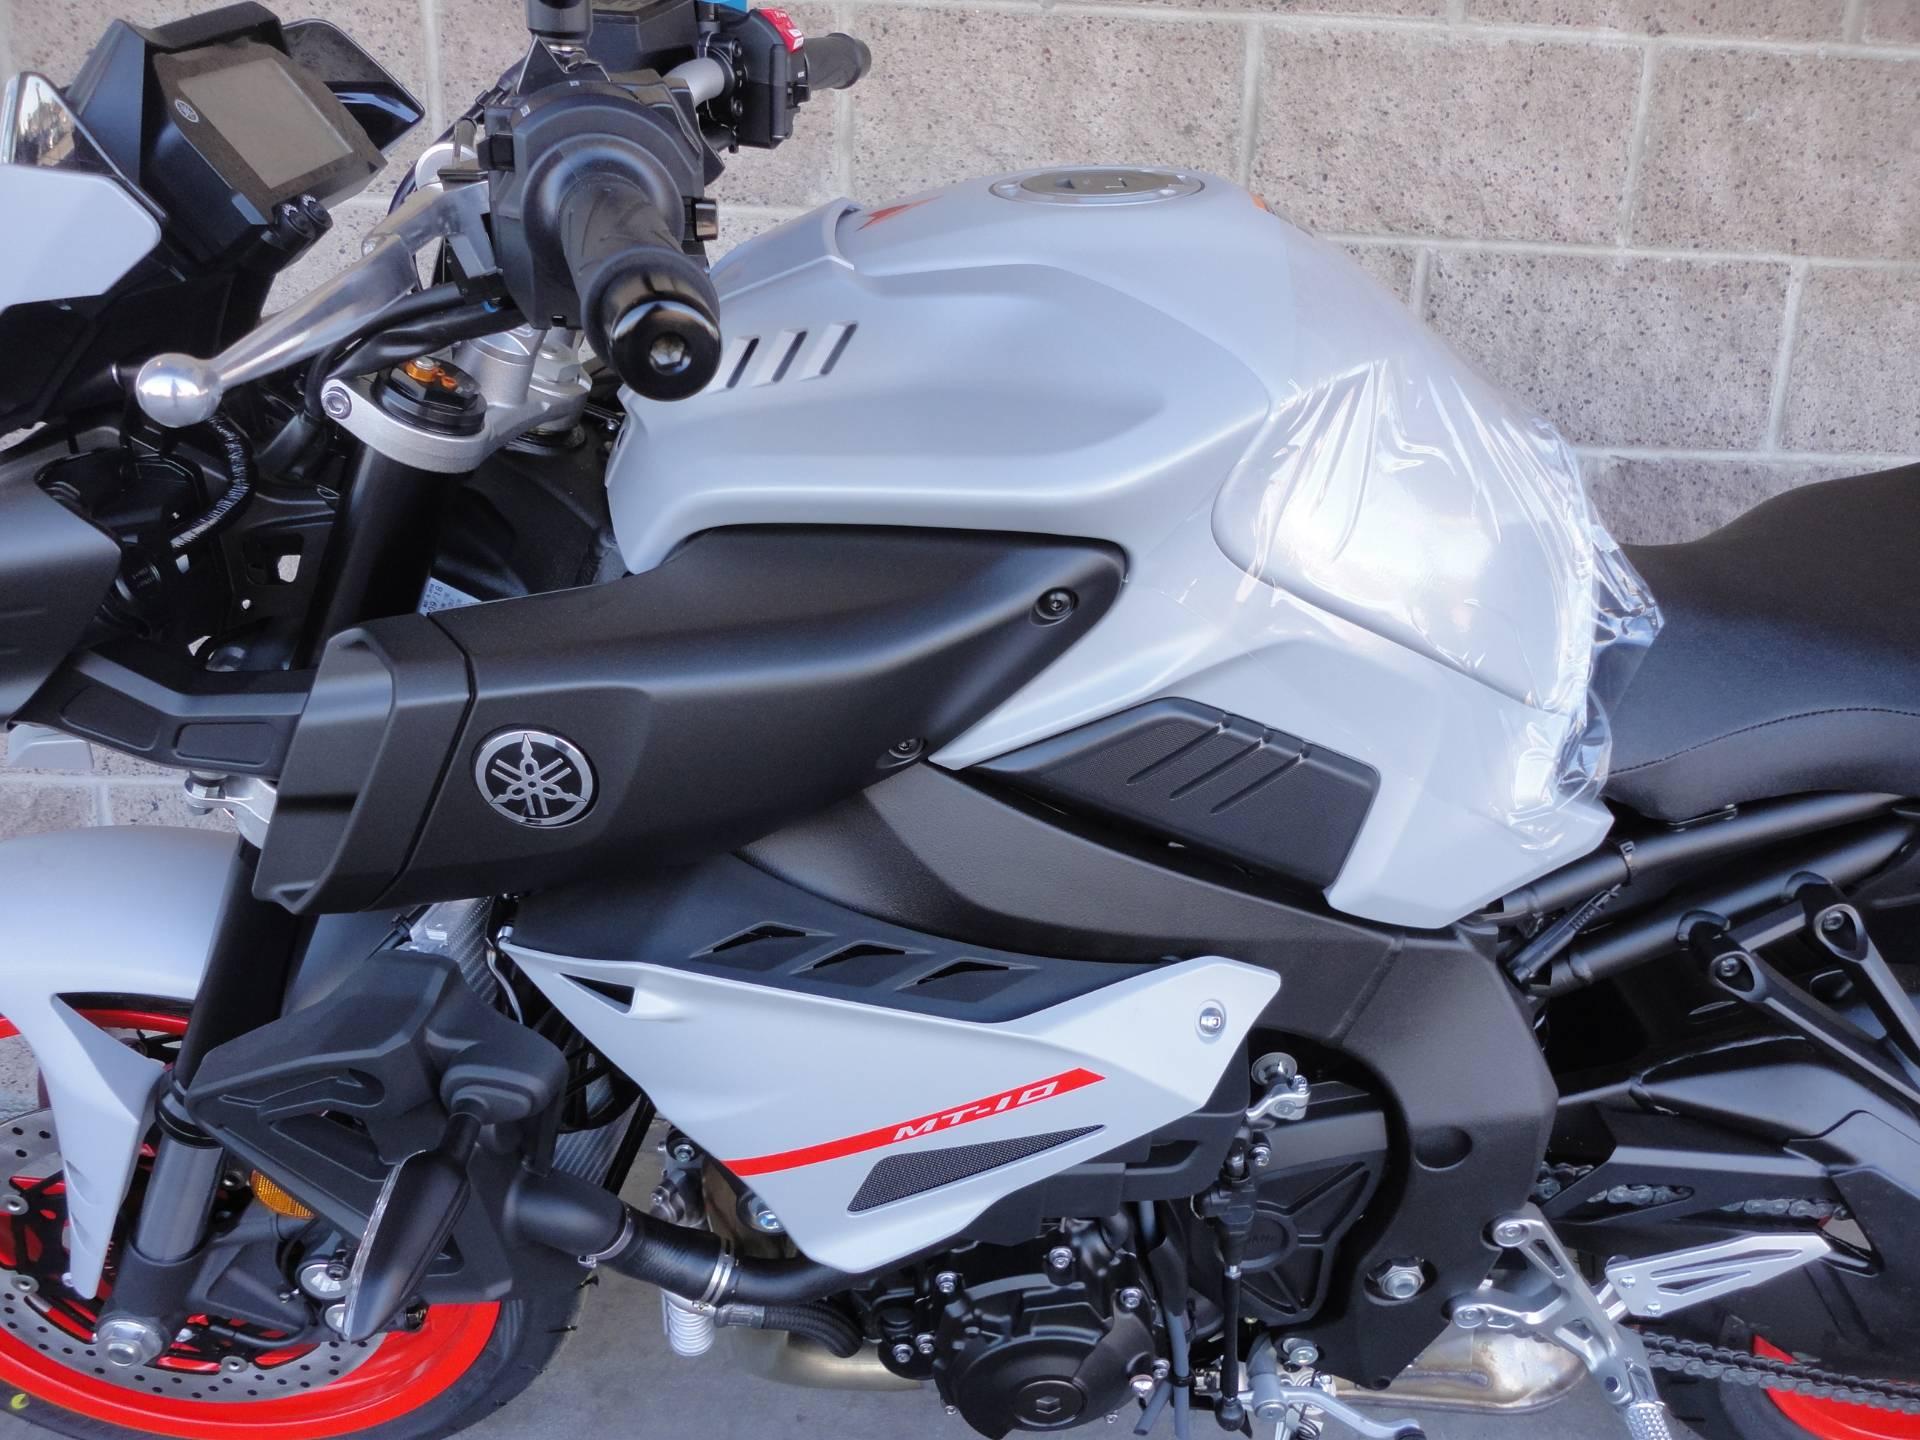 2019 Yamaha MT-10 3